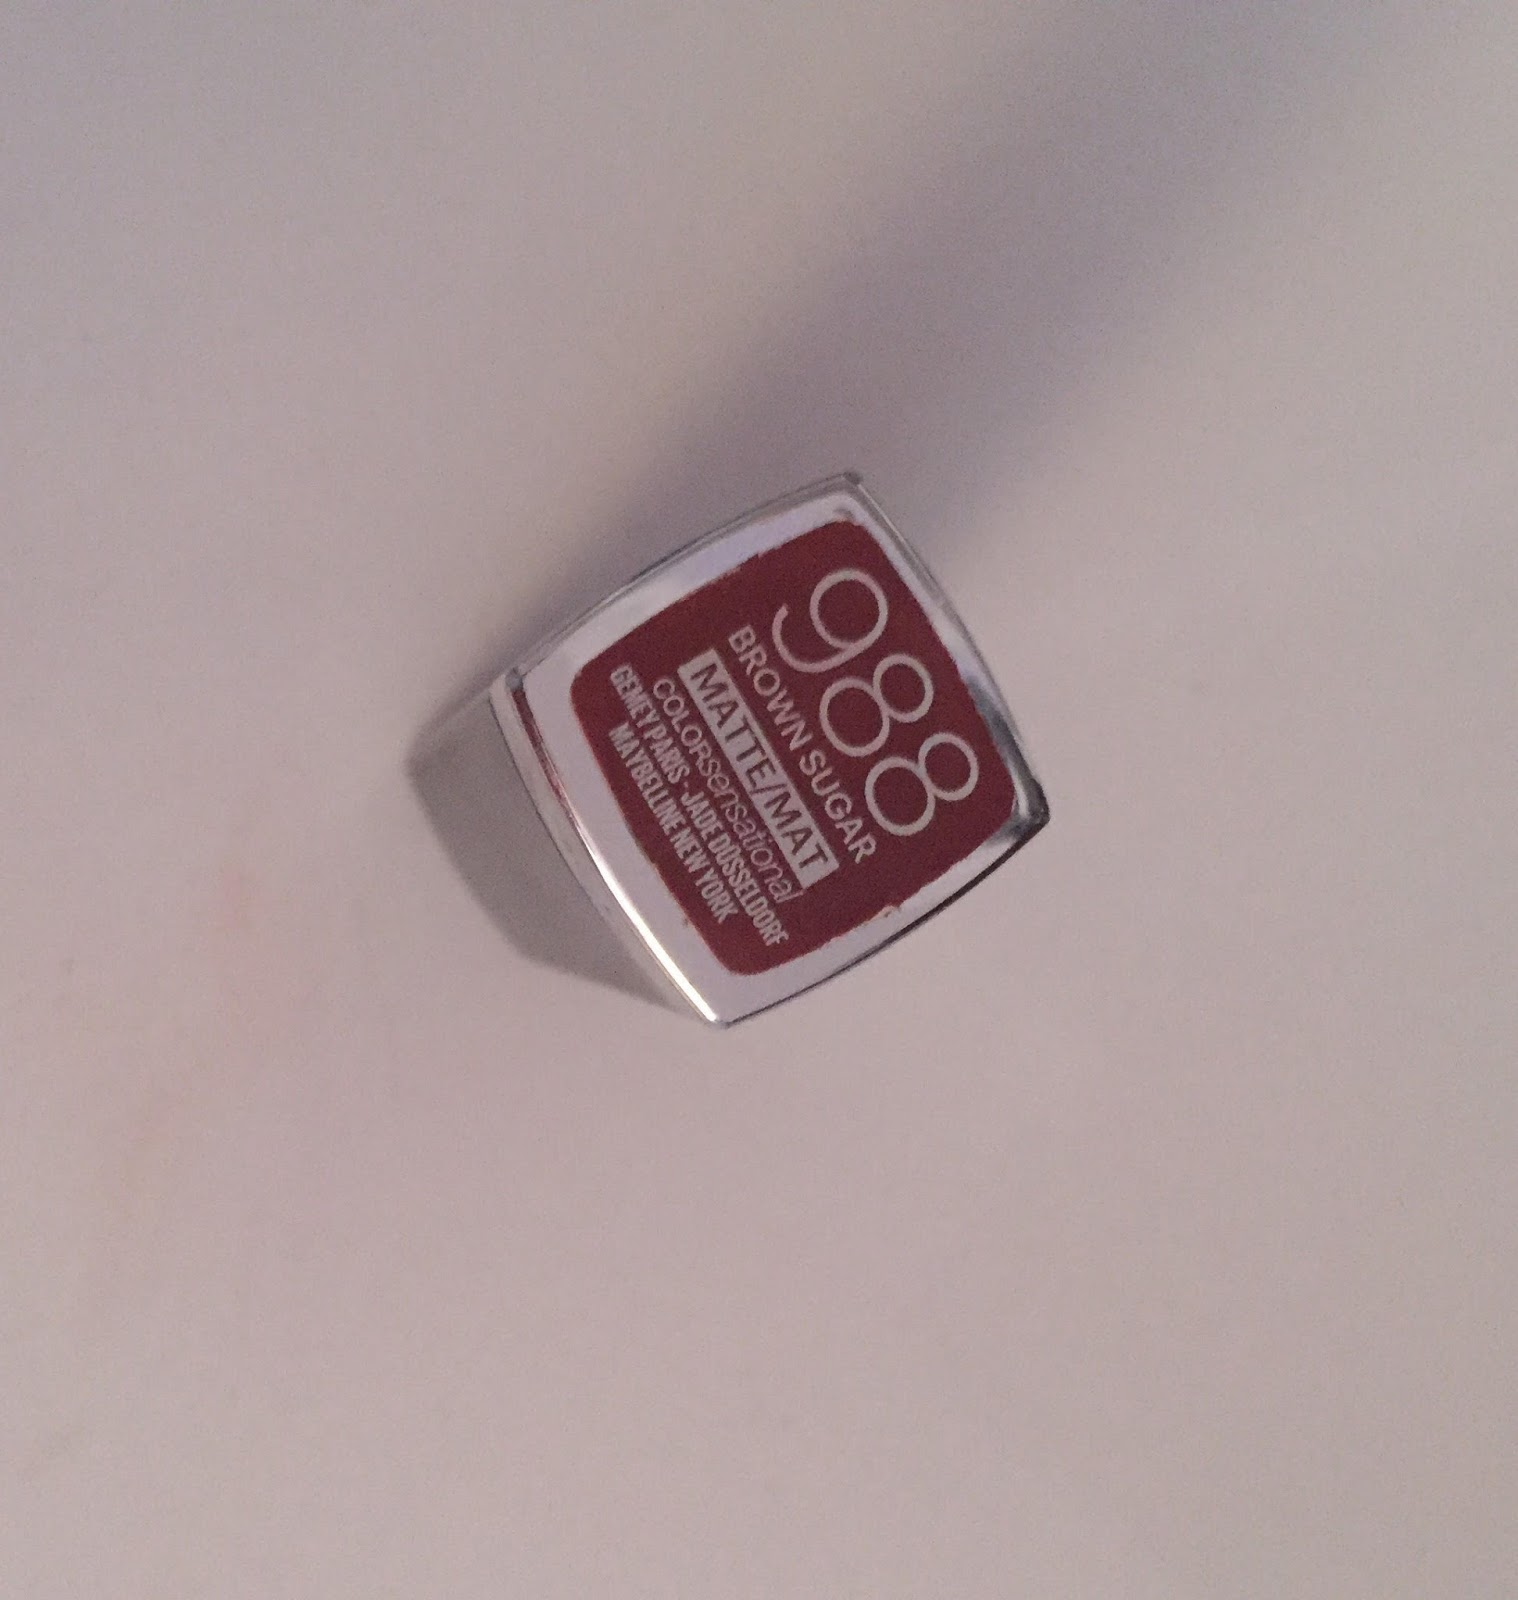 Menekşe Kokulu Blog Maybelline 988 Brown Sugar Mattemat Lipstick